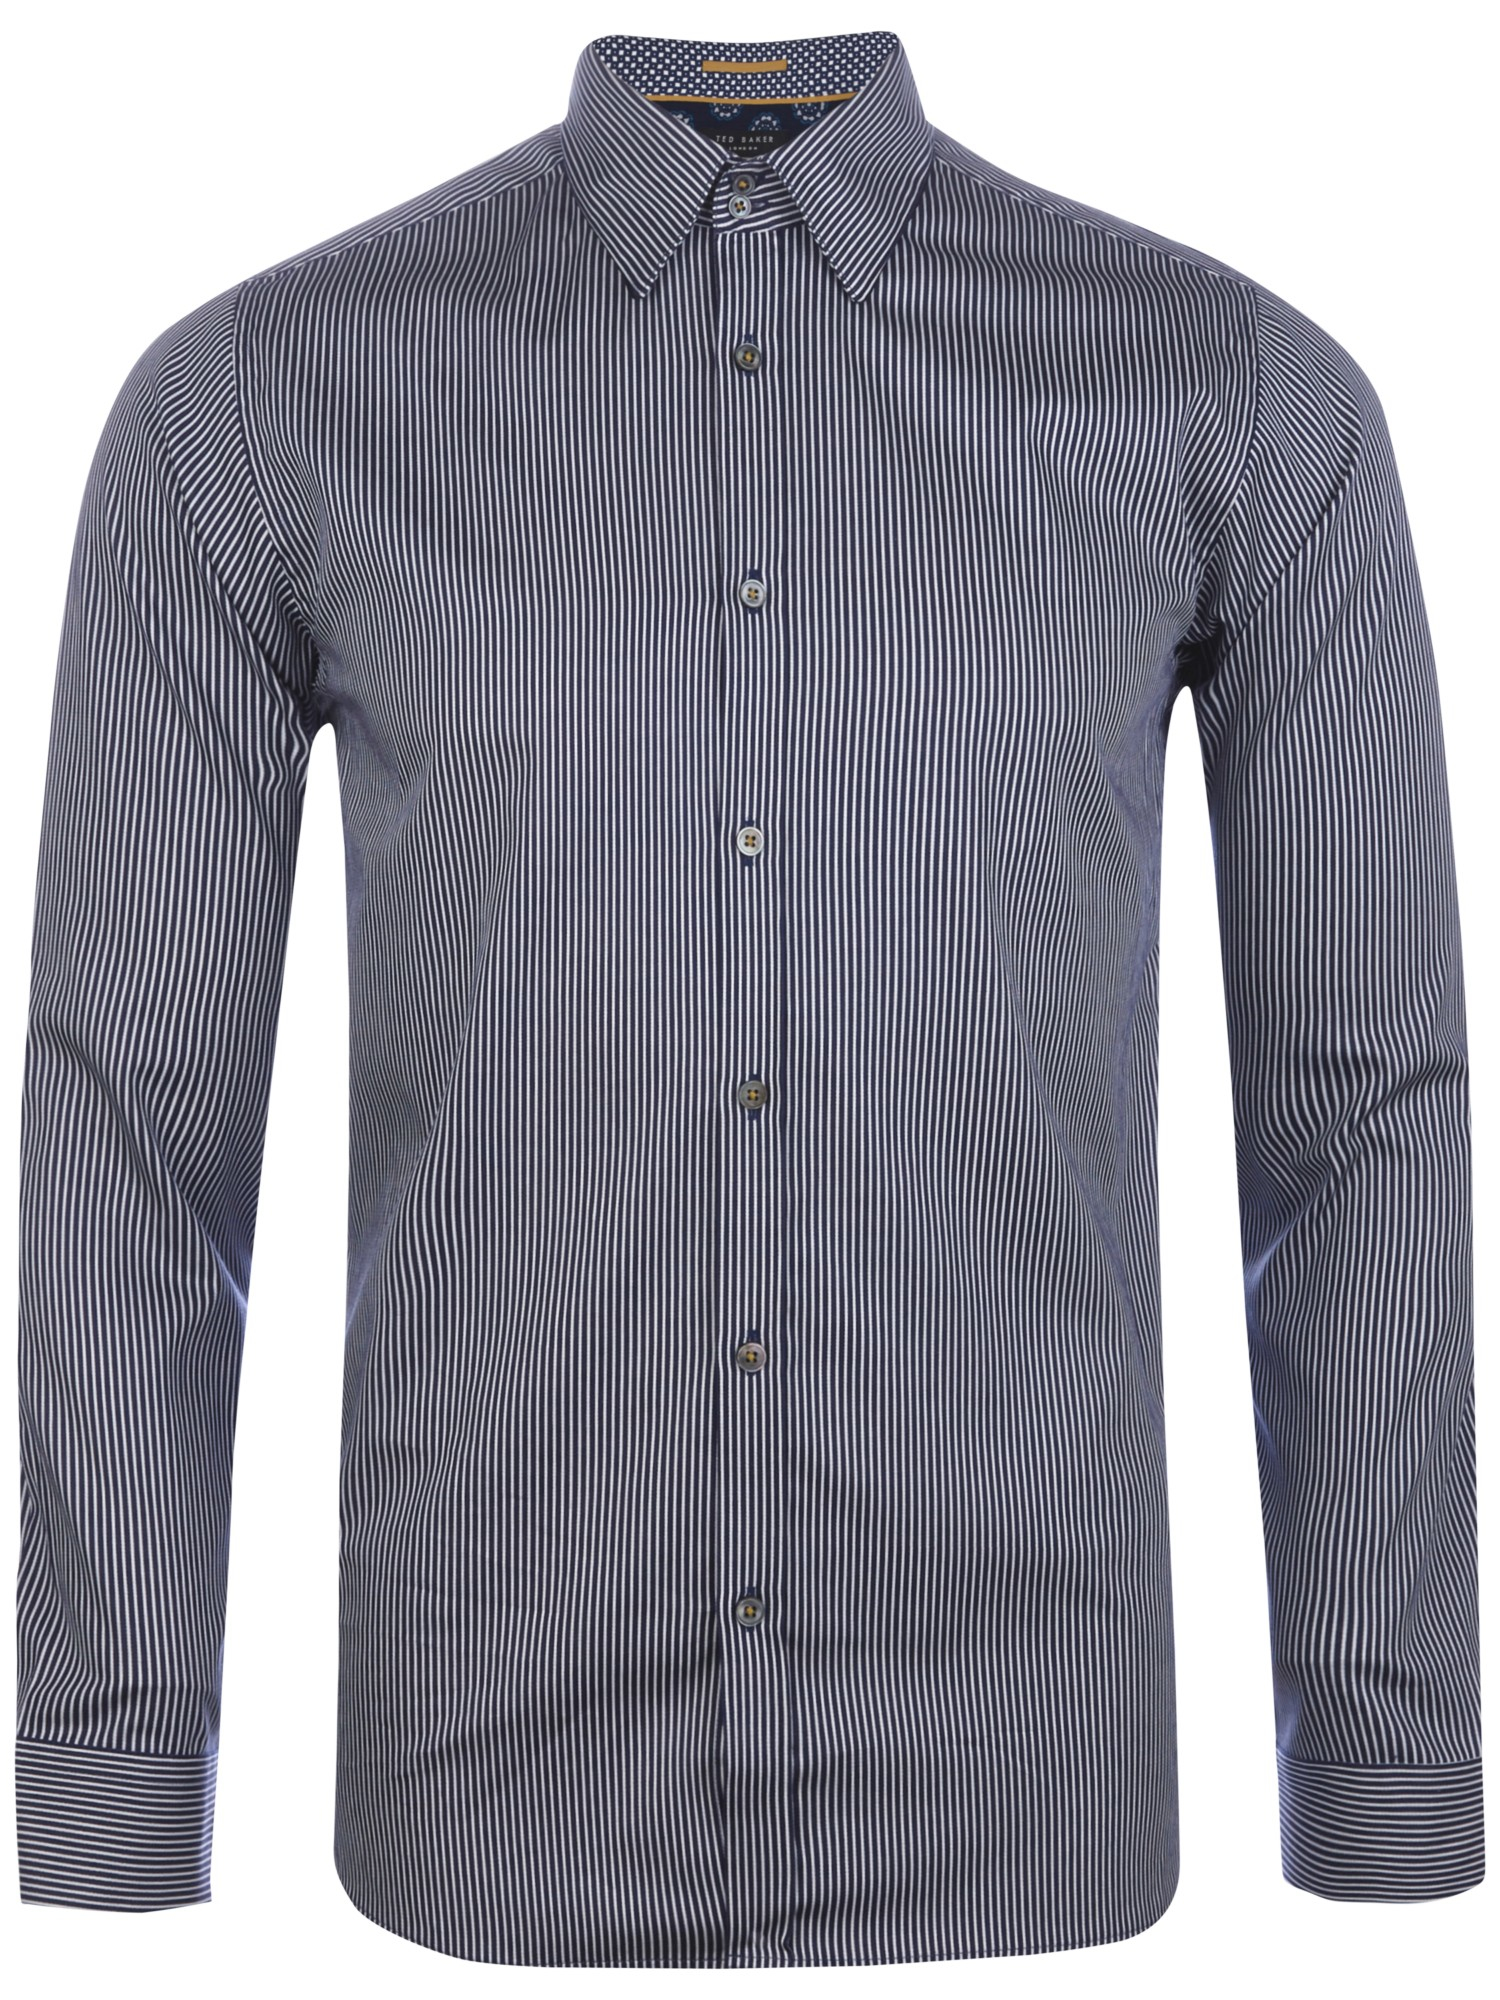 Ted baker verticl stripe long sleeve shirt in blue for men for Navy blue striped long sleeve shirt